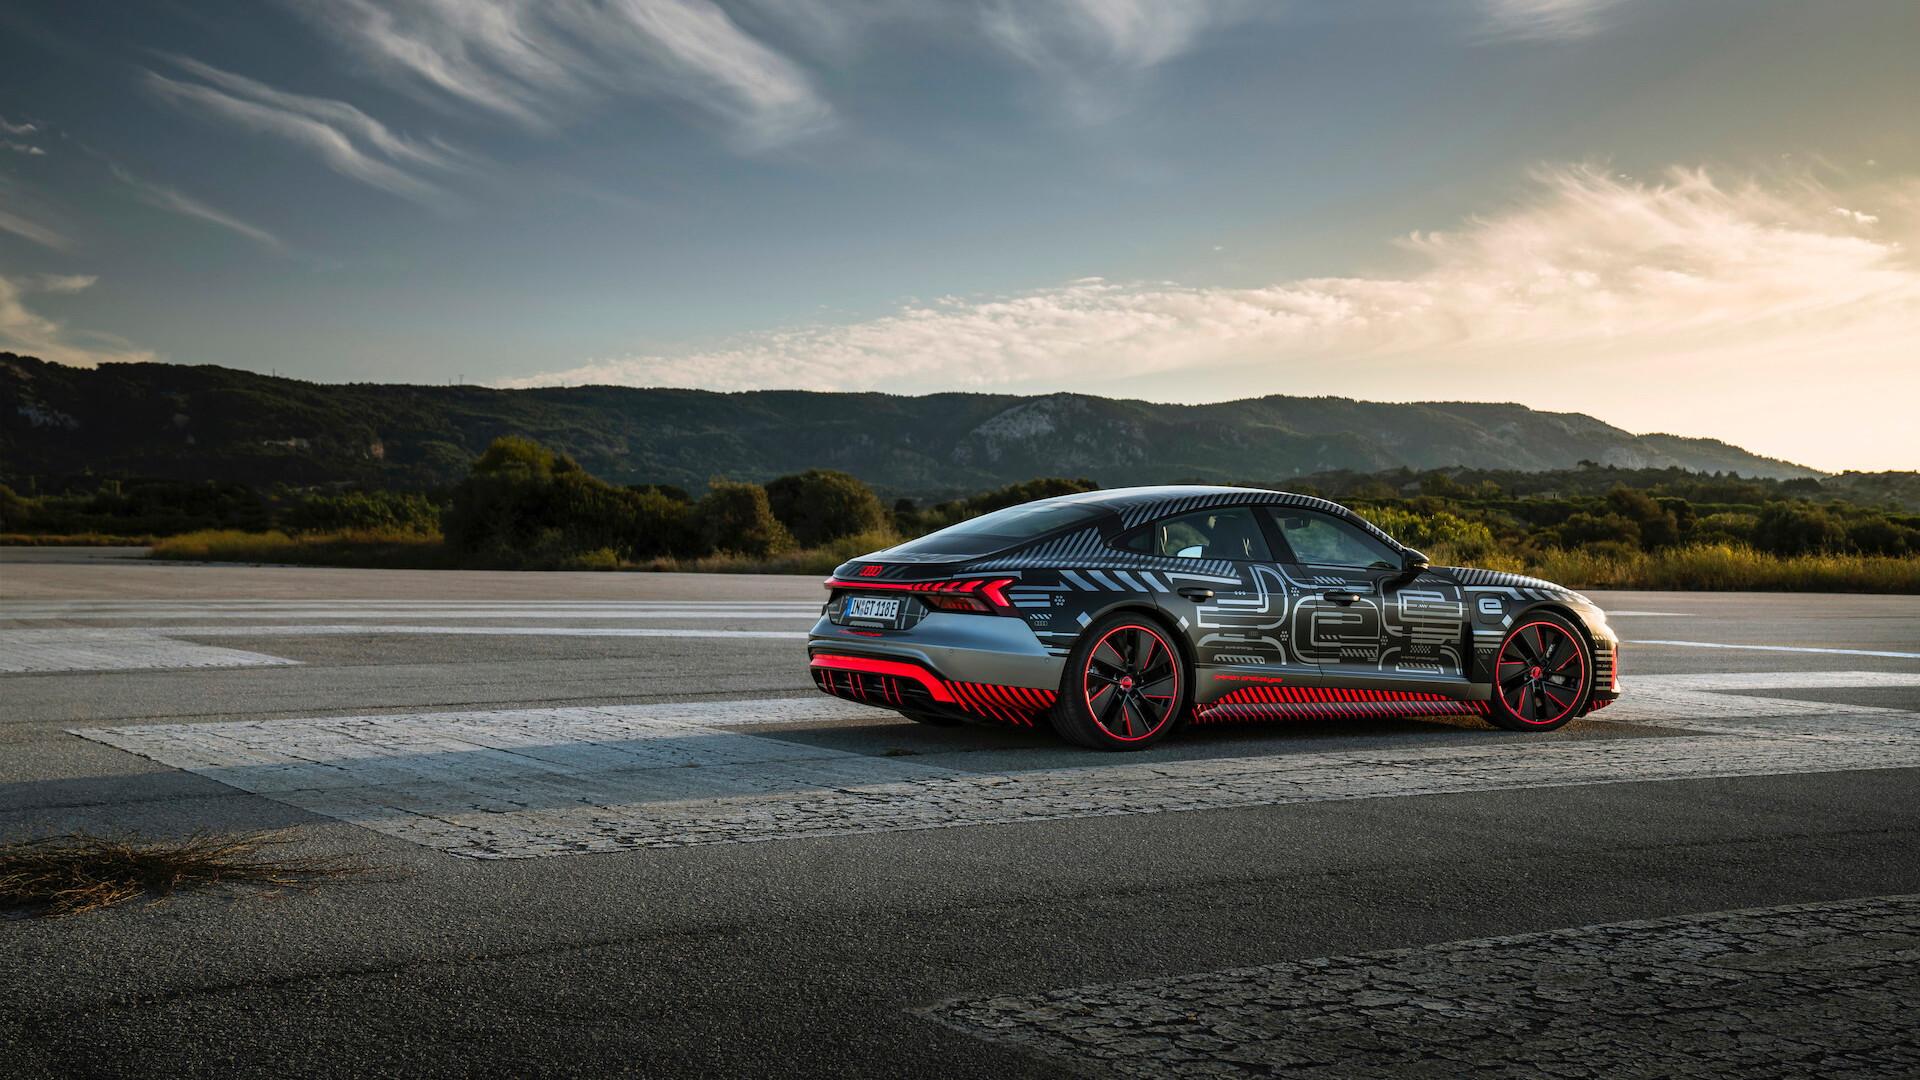 2022 Audi E-Tron GT prototype